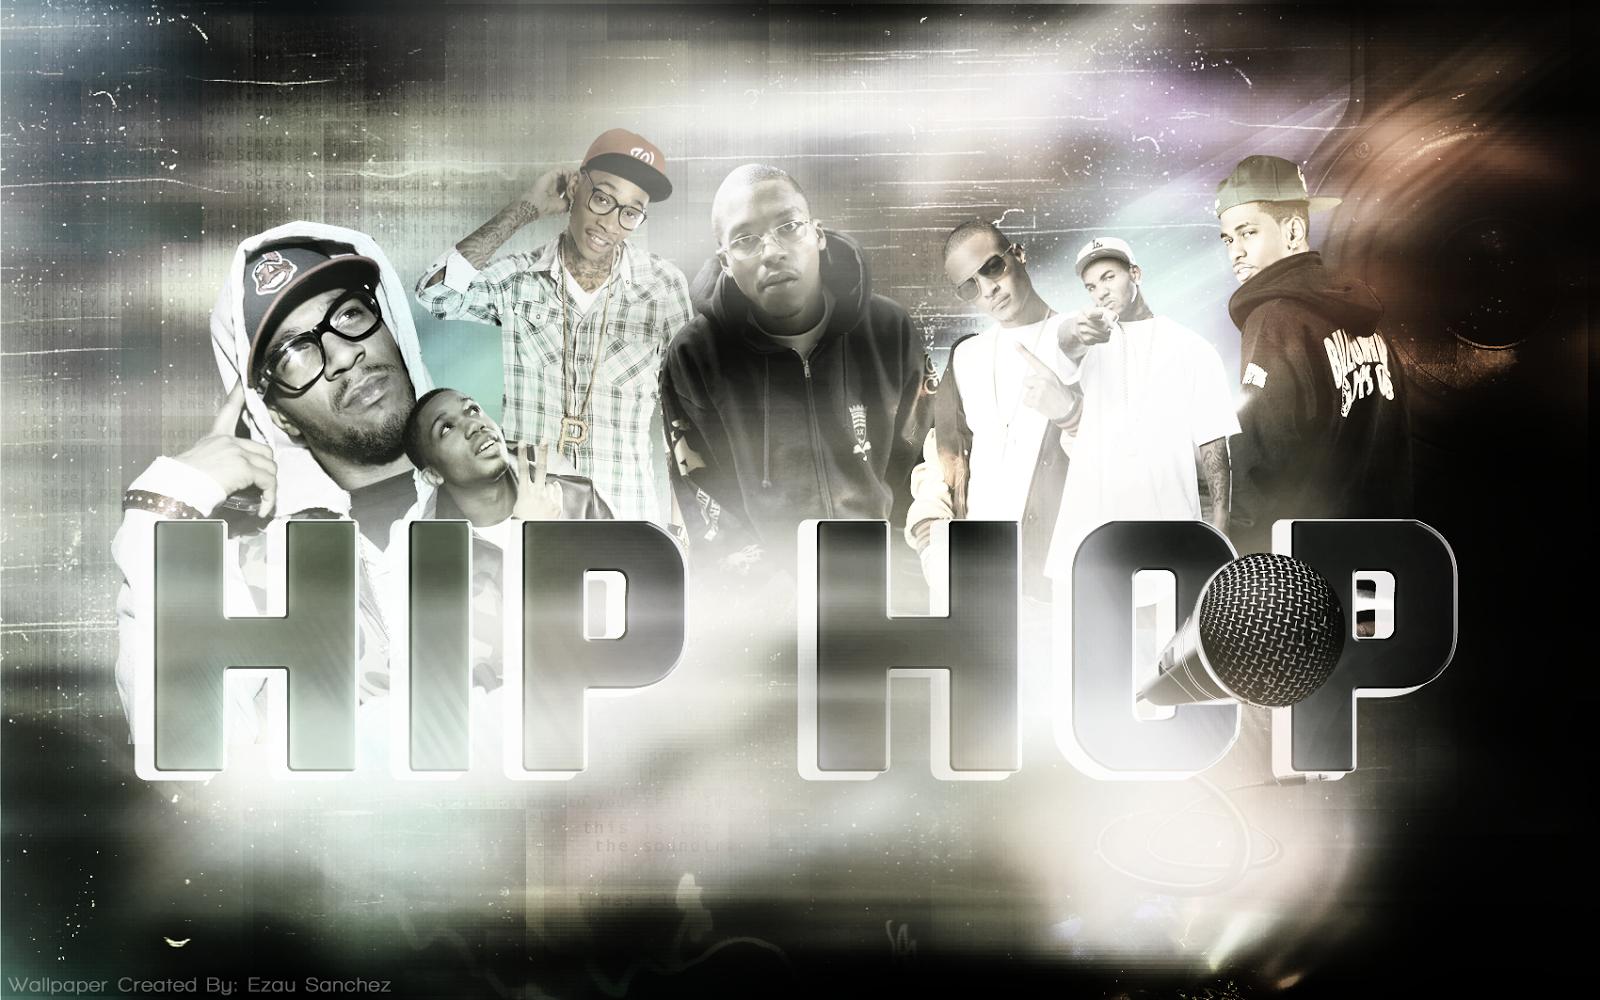 http://2.bp.blogspot.com/-4ScsCi67yVw/T7ANaYyRlSI/AAAAAAAAA5w/p071Rkmzc7M/s1600/Top8hip-hop.png